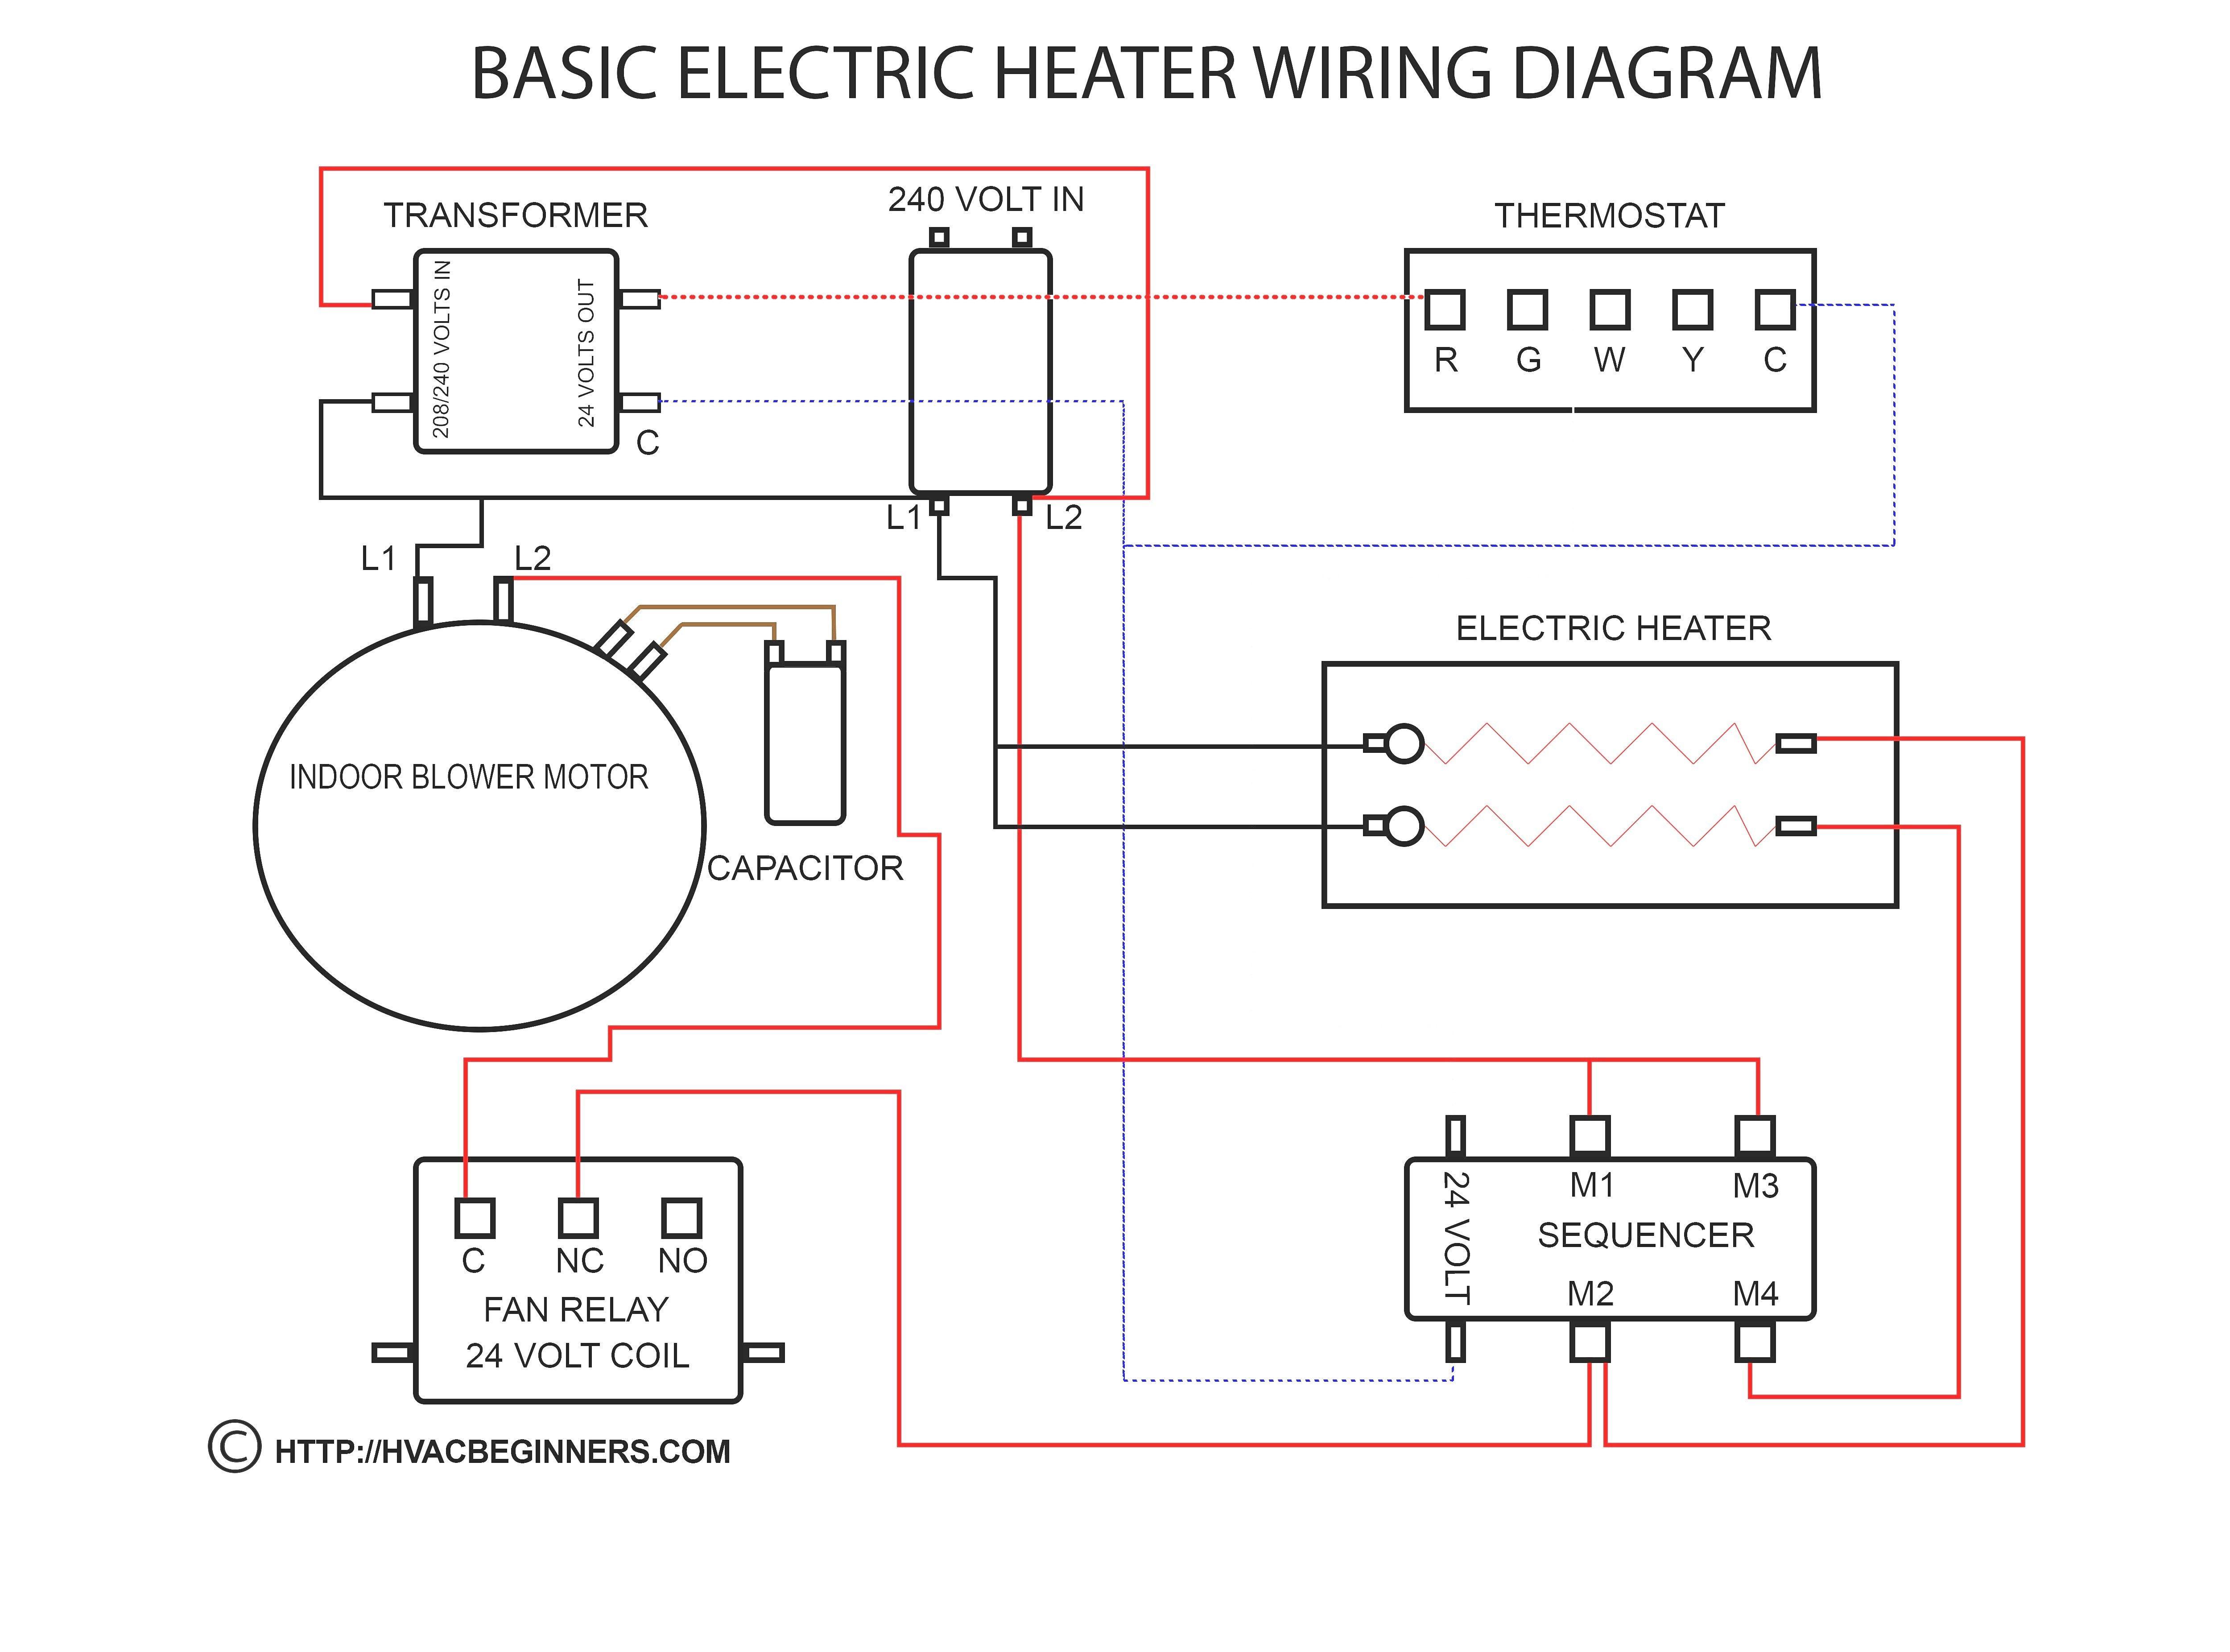 Unique Wiring Colors Electrical Diagram Wiringdiagram Diagramming Diagramm Visuals V Basic Electrical Wiring Thermostat Wiring Electrical Circuit Diagram